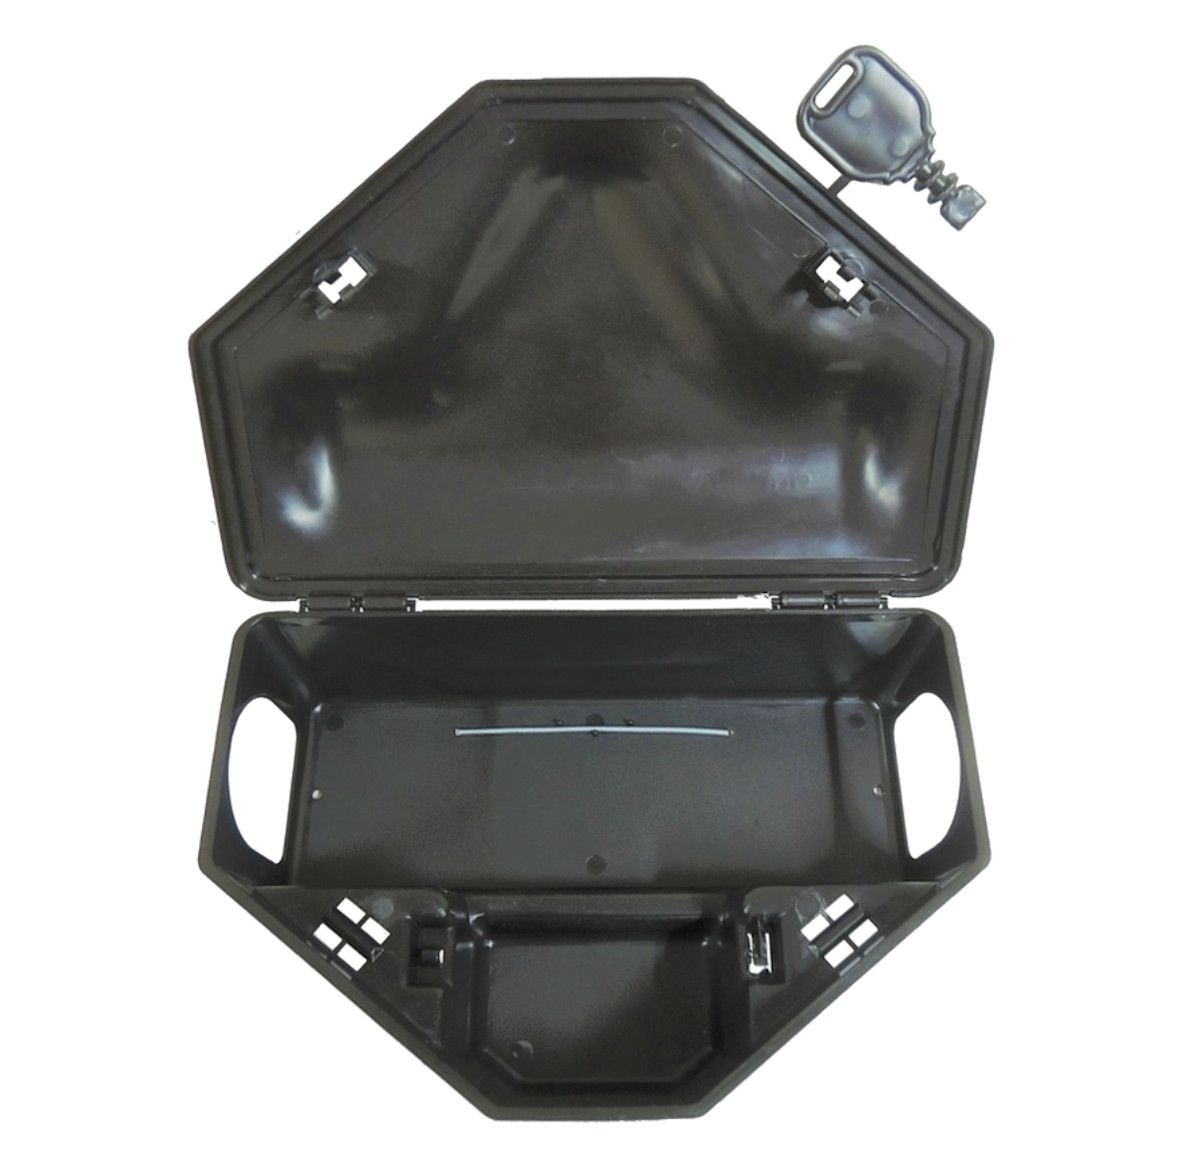 Kit 65 Porta Isca Com 2 Chaves - Duplo Travamento